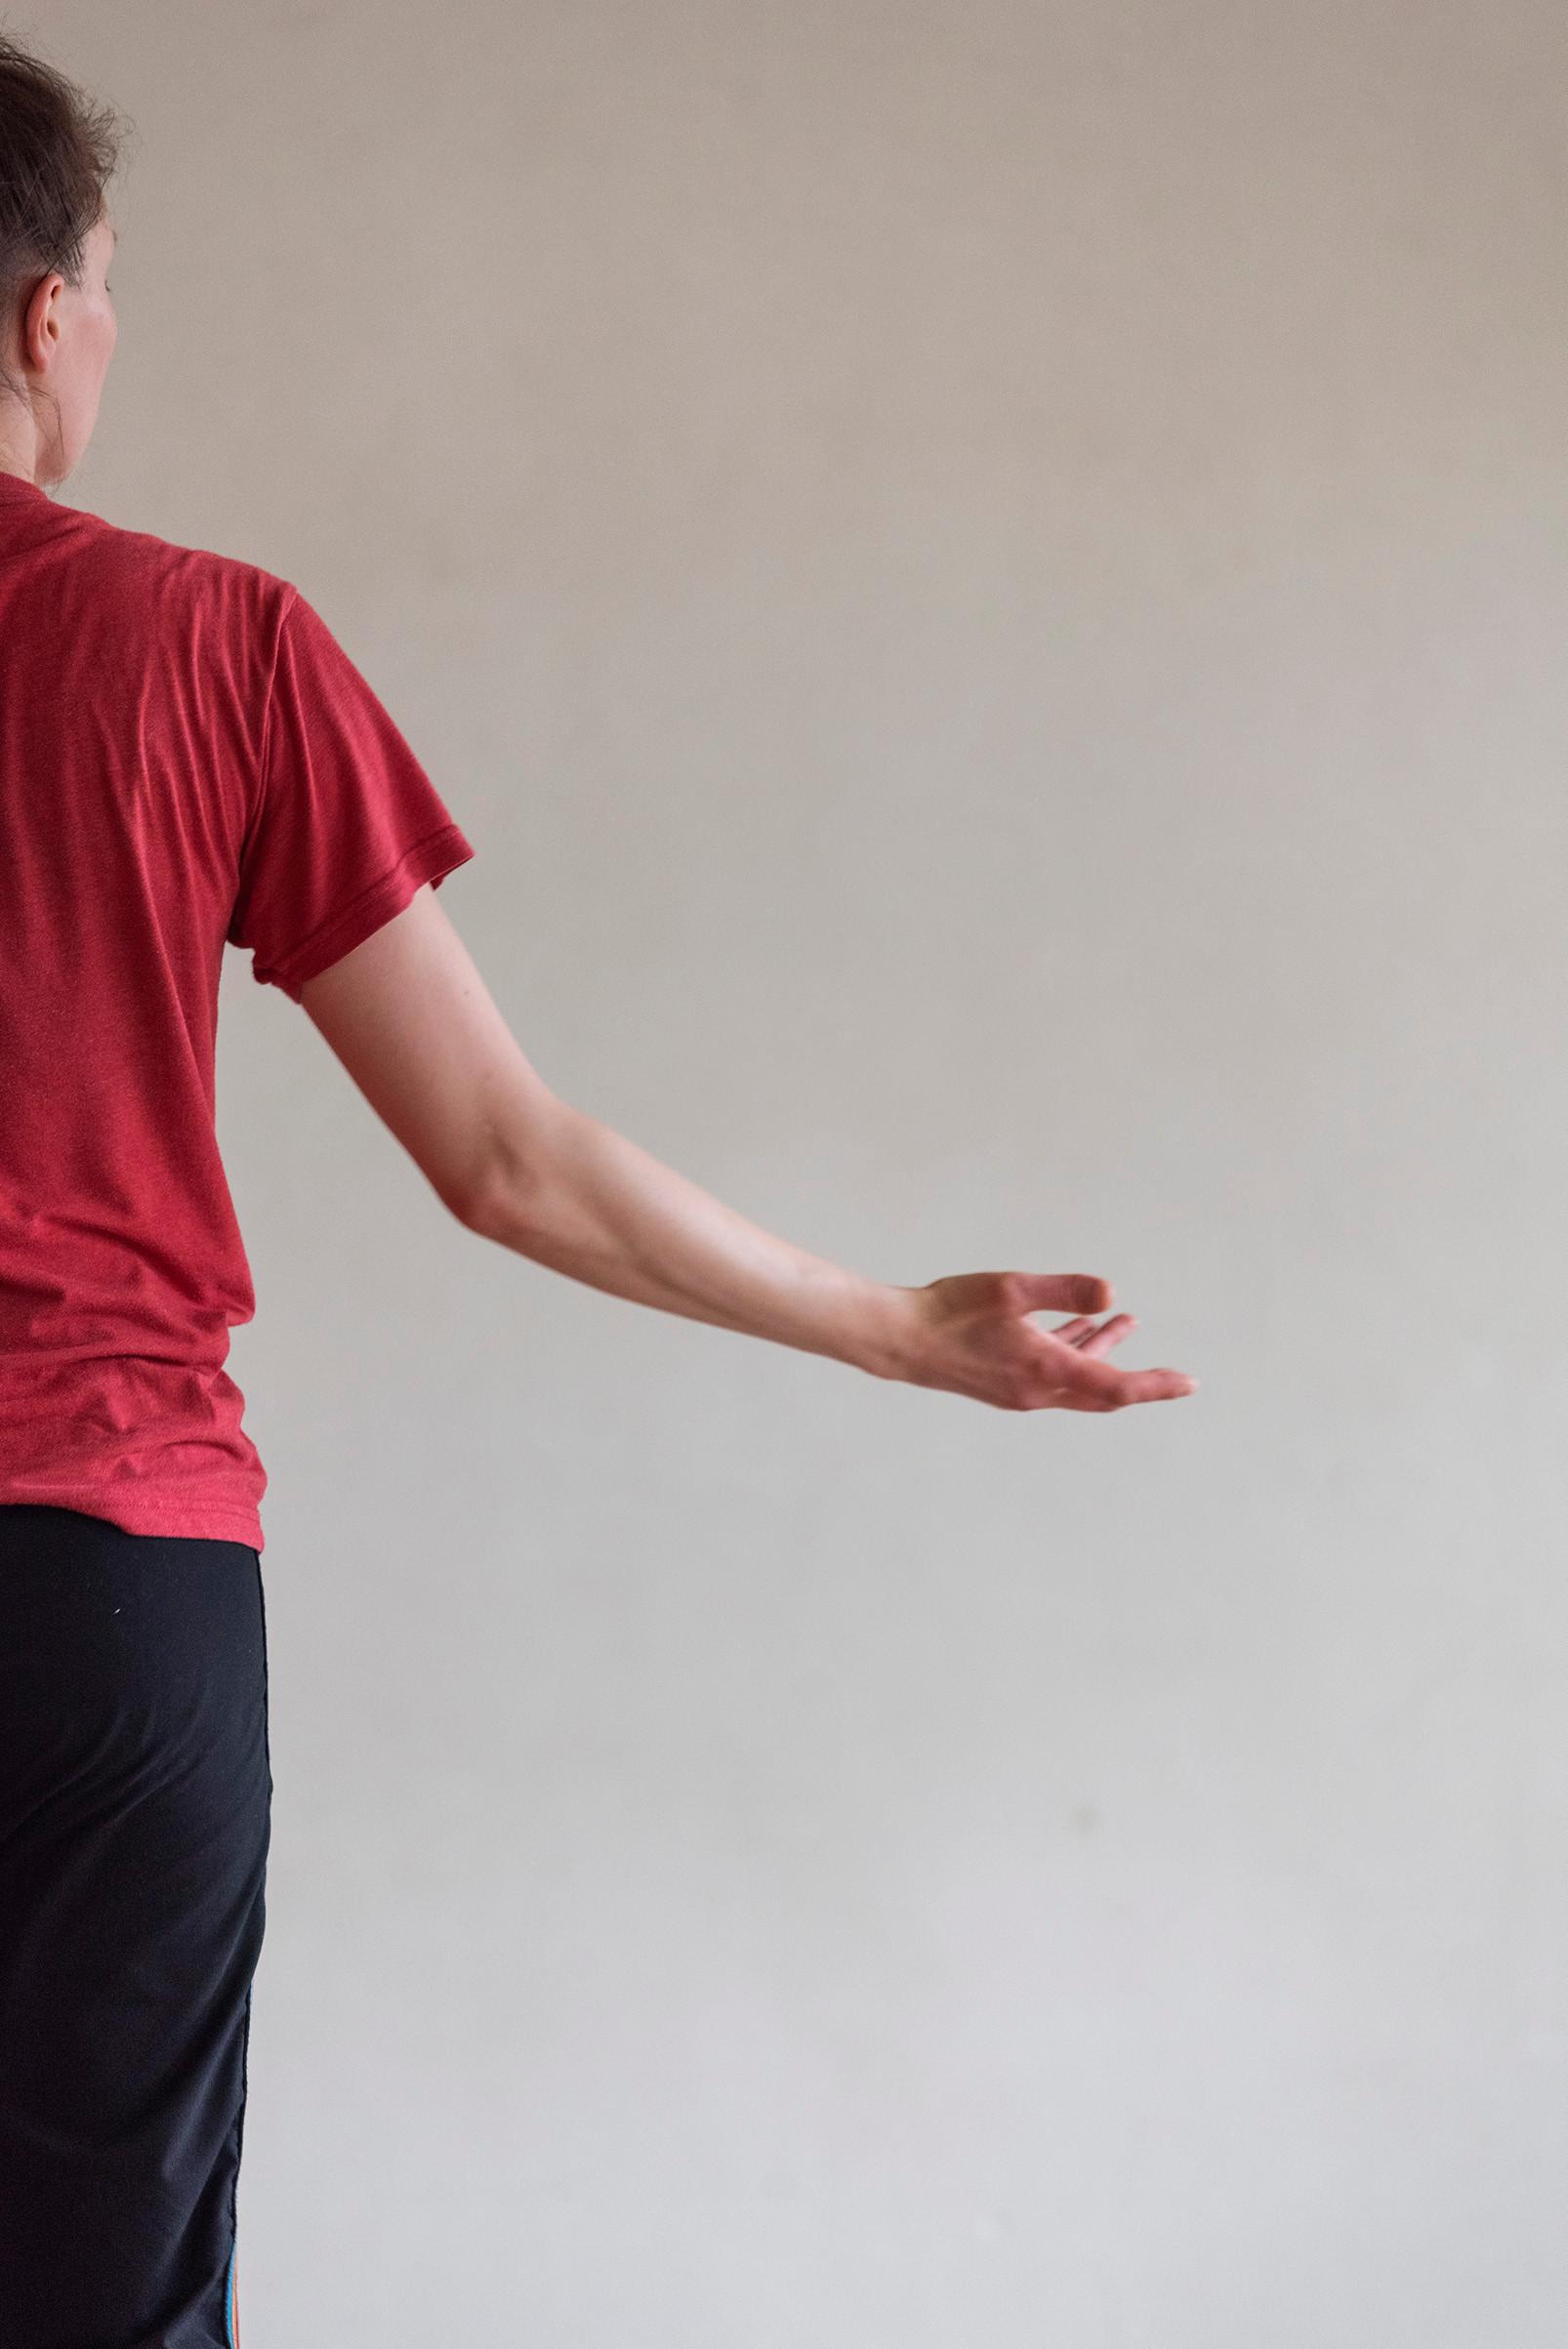 Open Level Yoga (9am-10:15am)